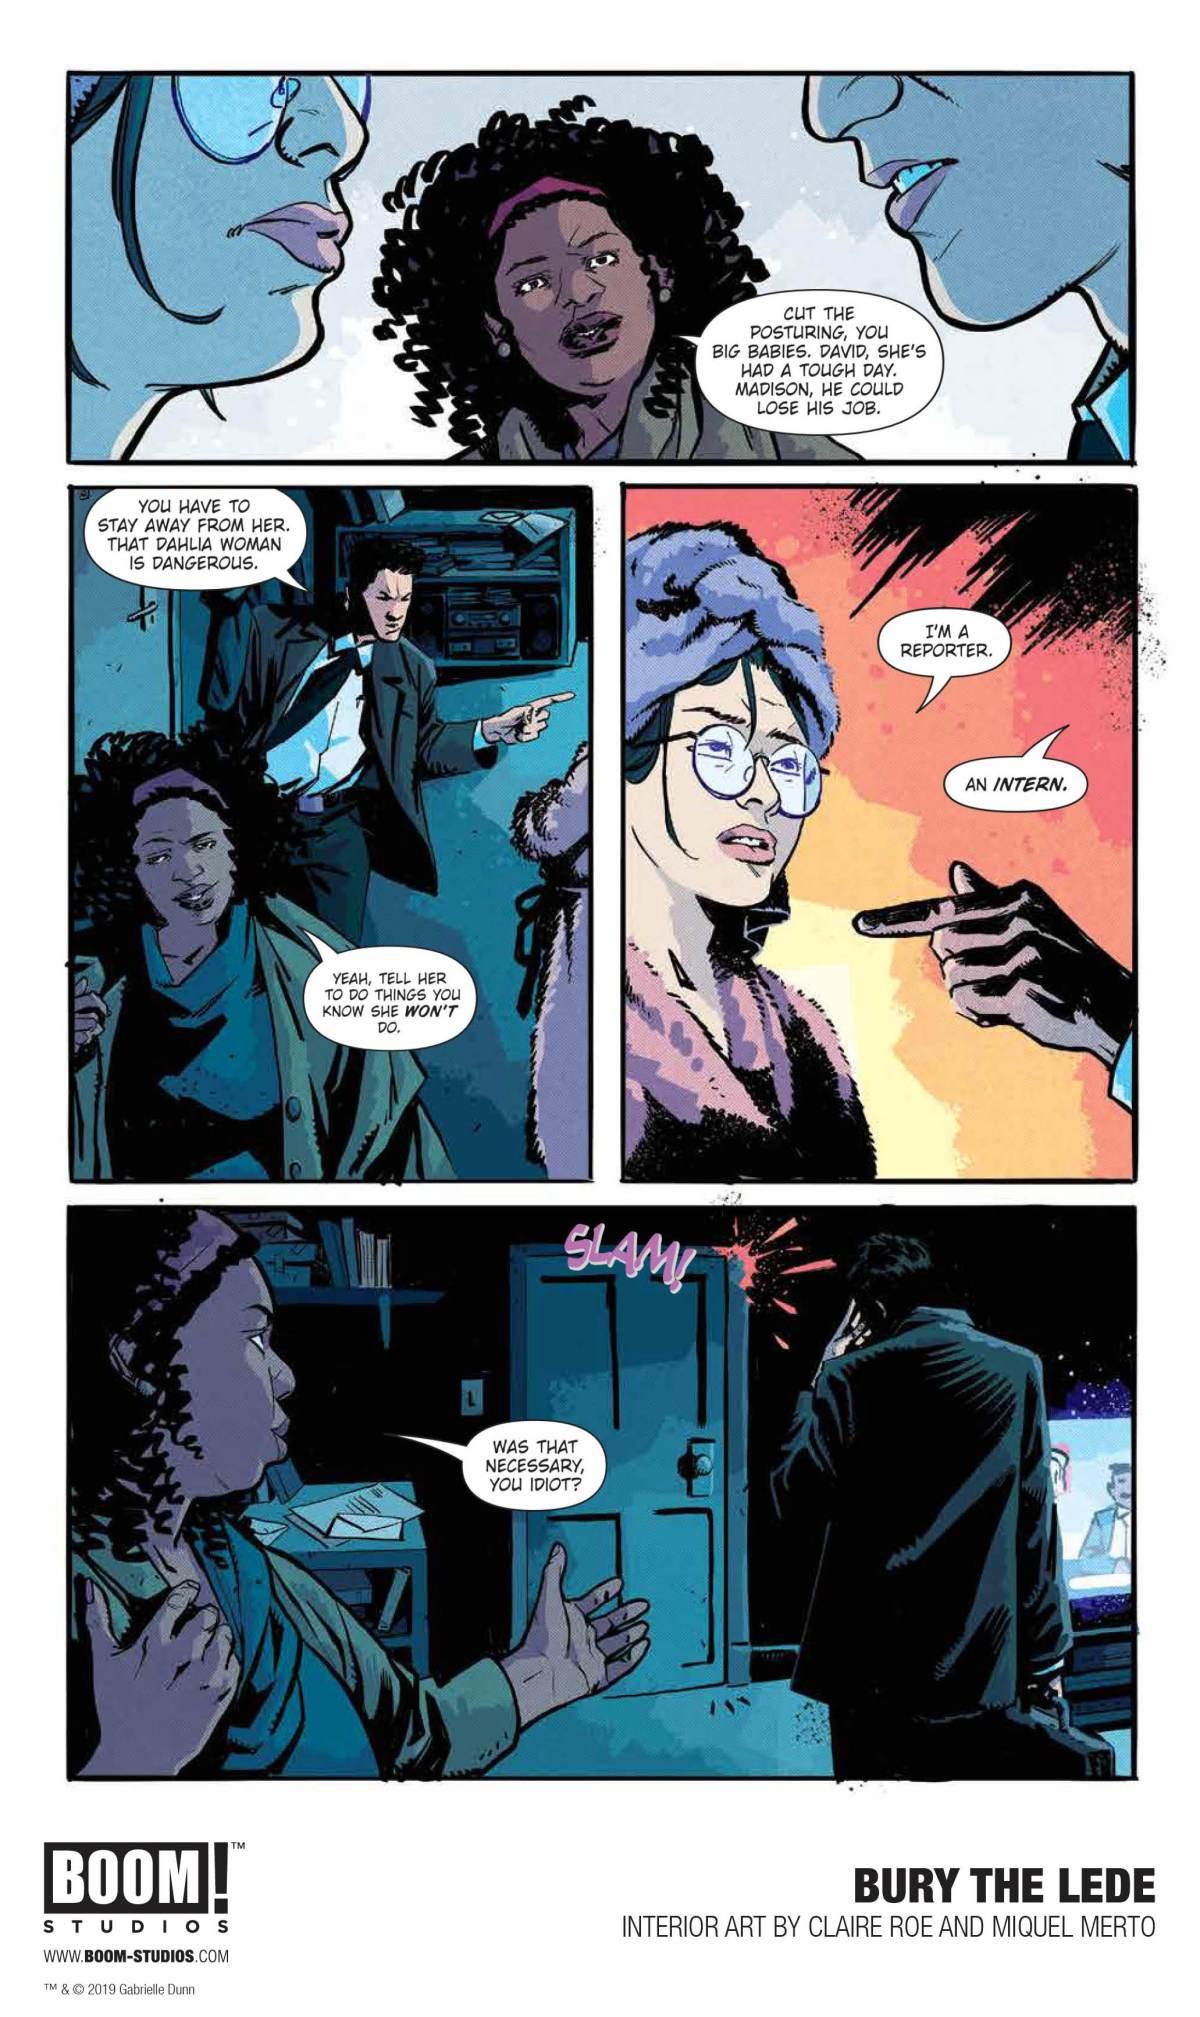 BURY THE LEDE, Page 9, BOOM! Studios 2019.